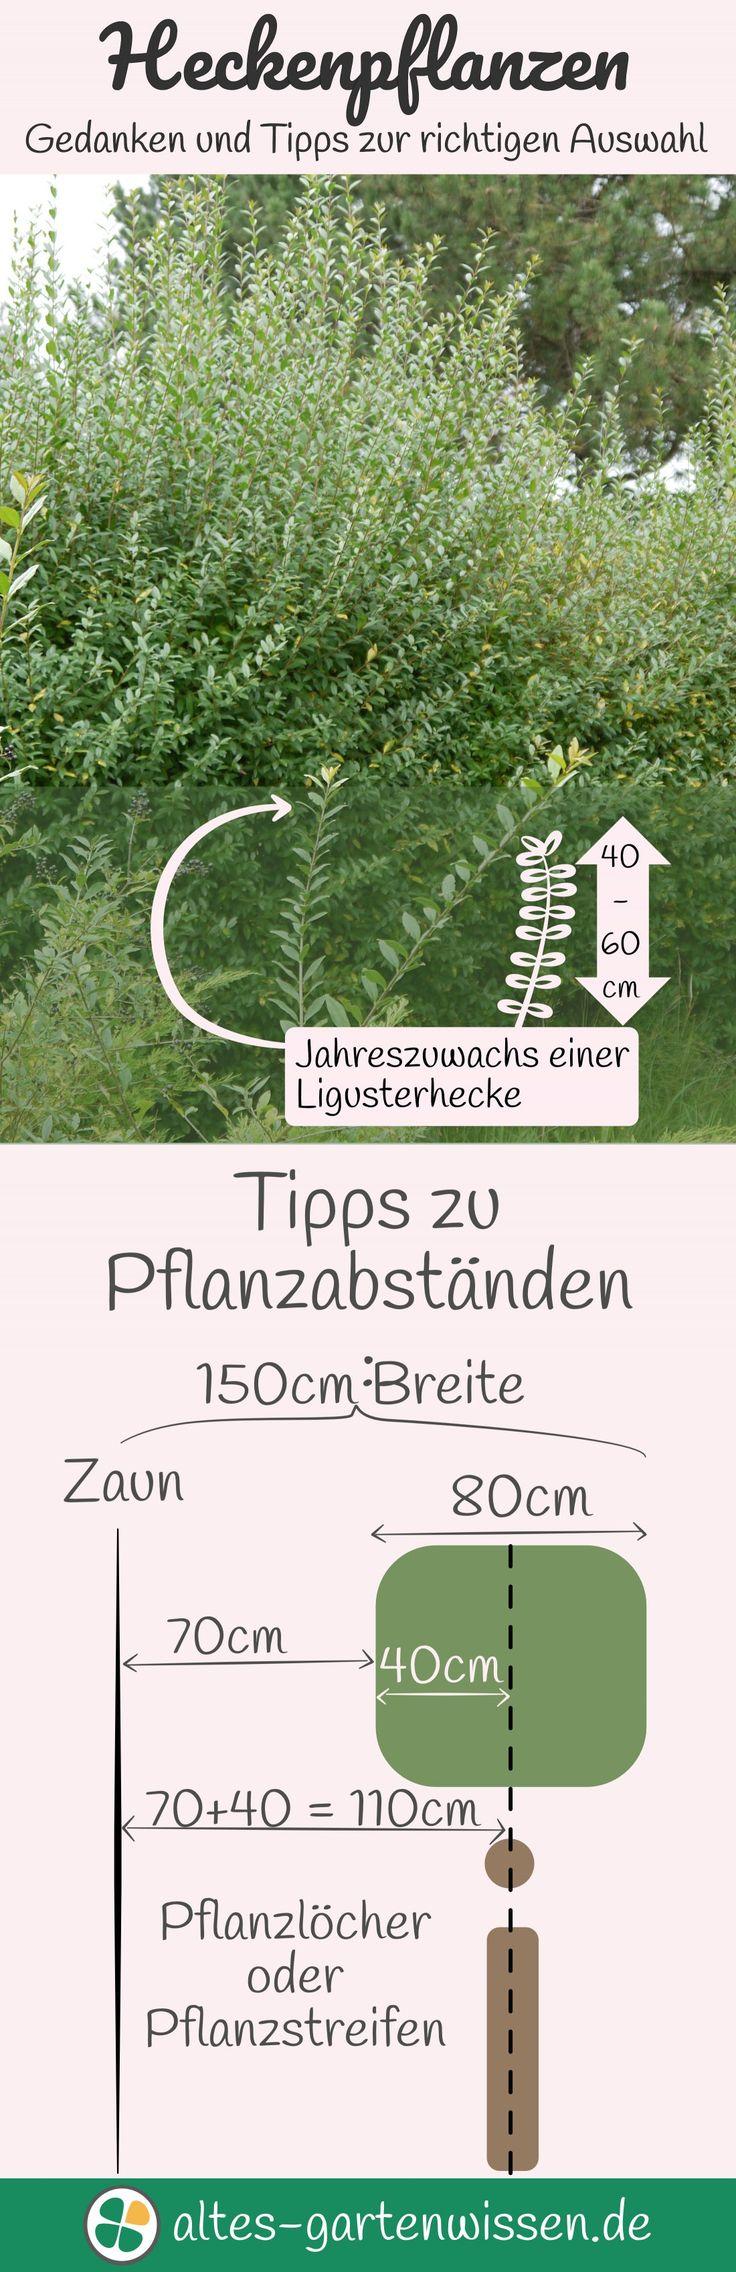 731 best Garten images on Pinterest | Home and garden, Plants and Garden